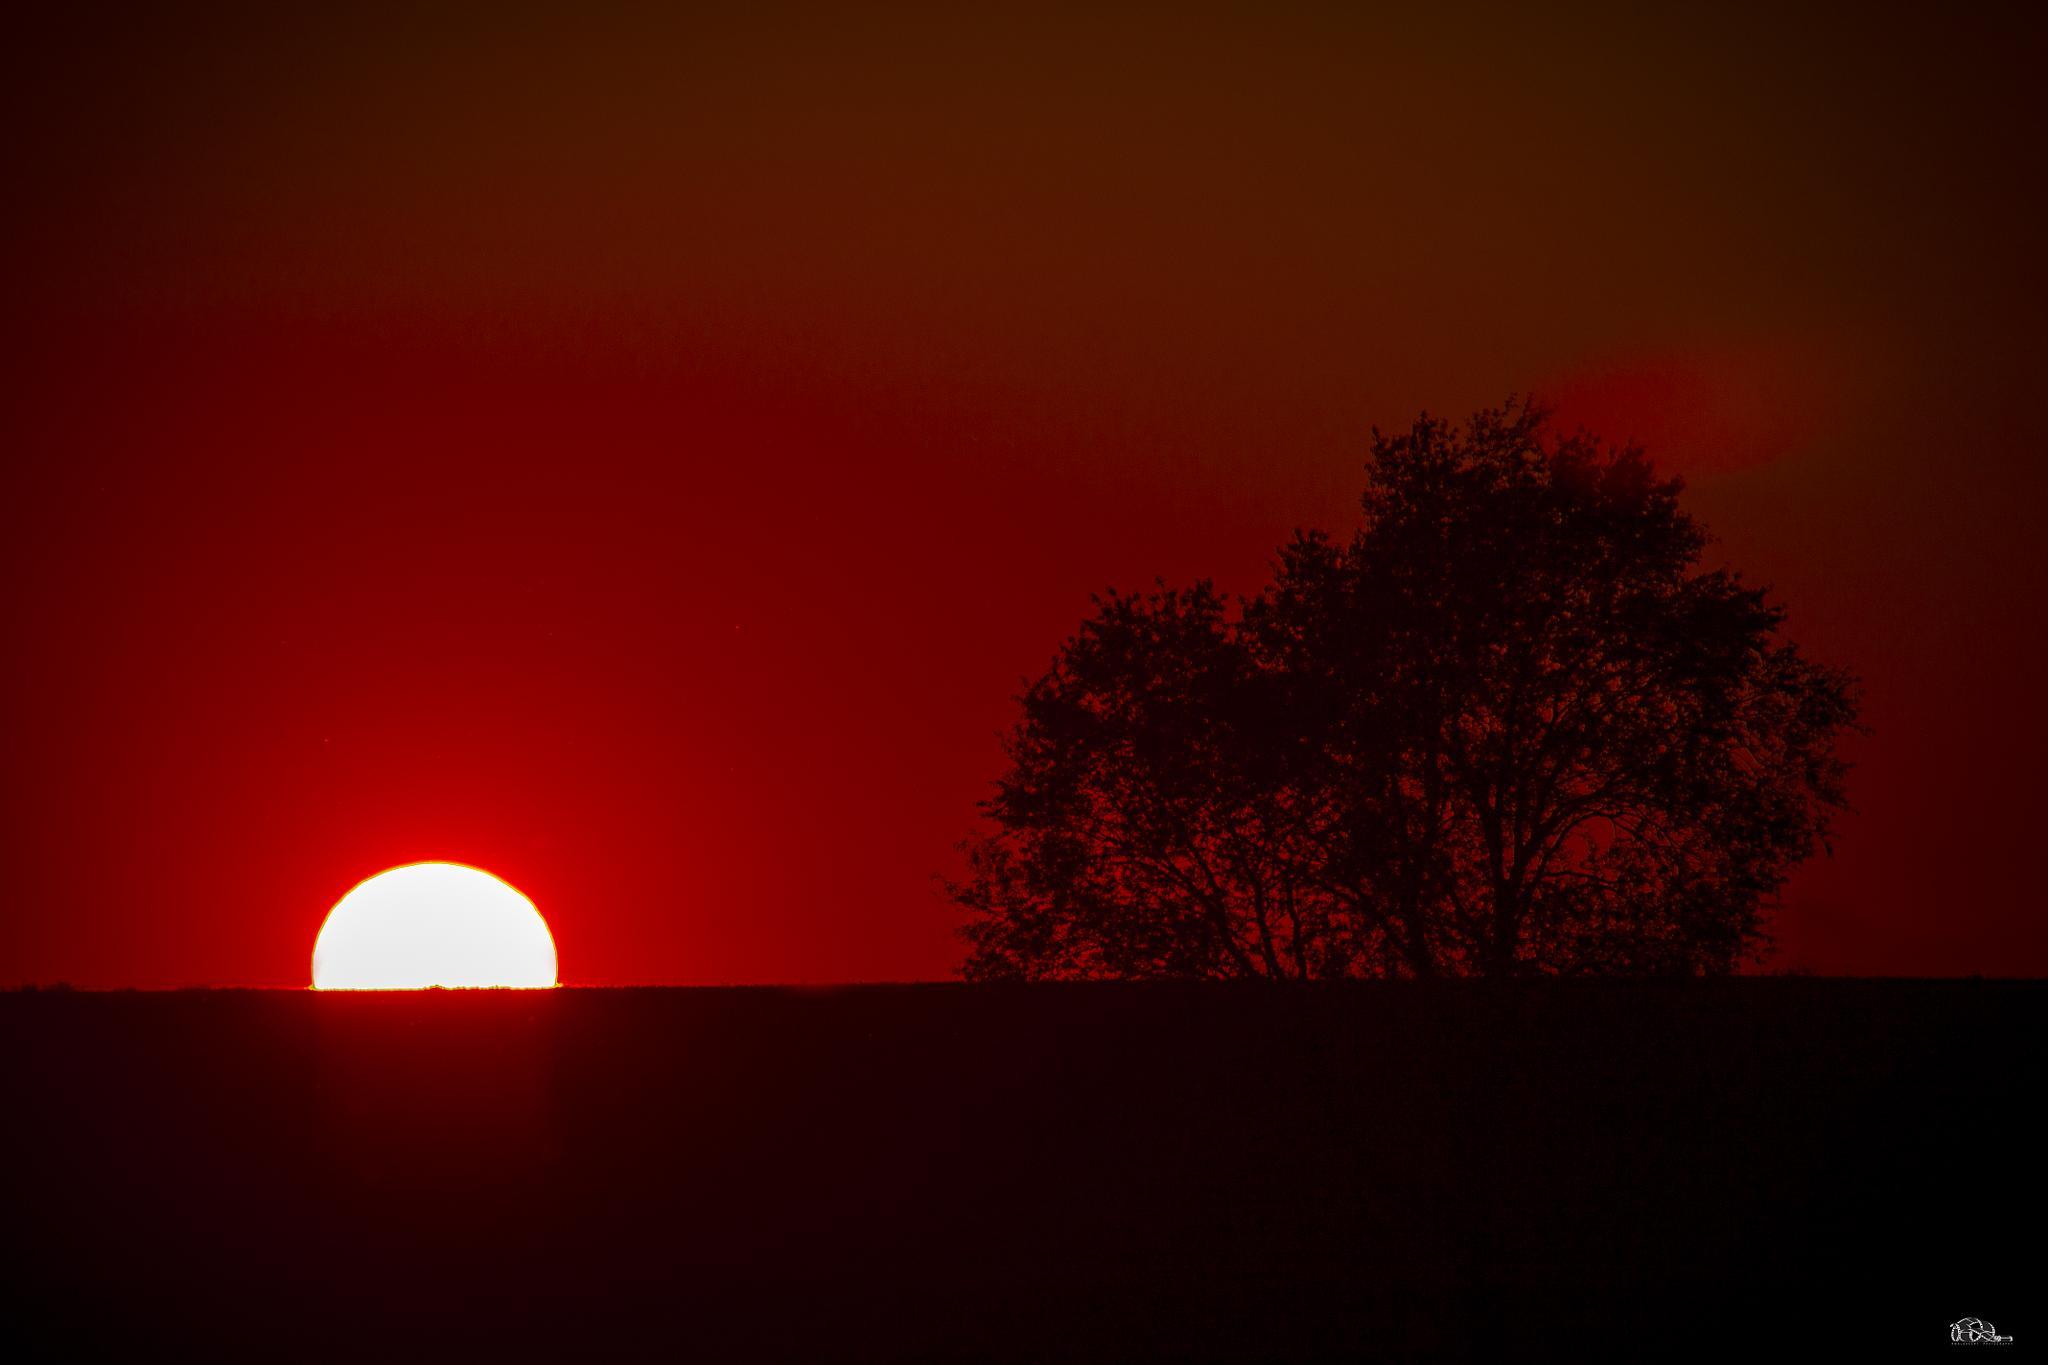 Sun tree by RWAlbrecht